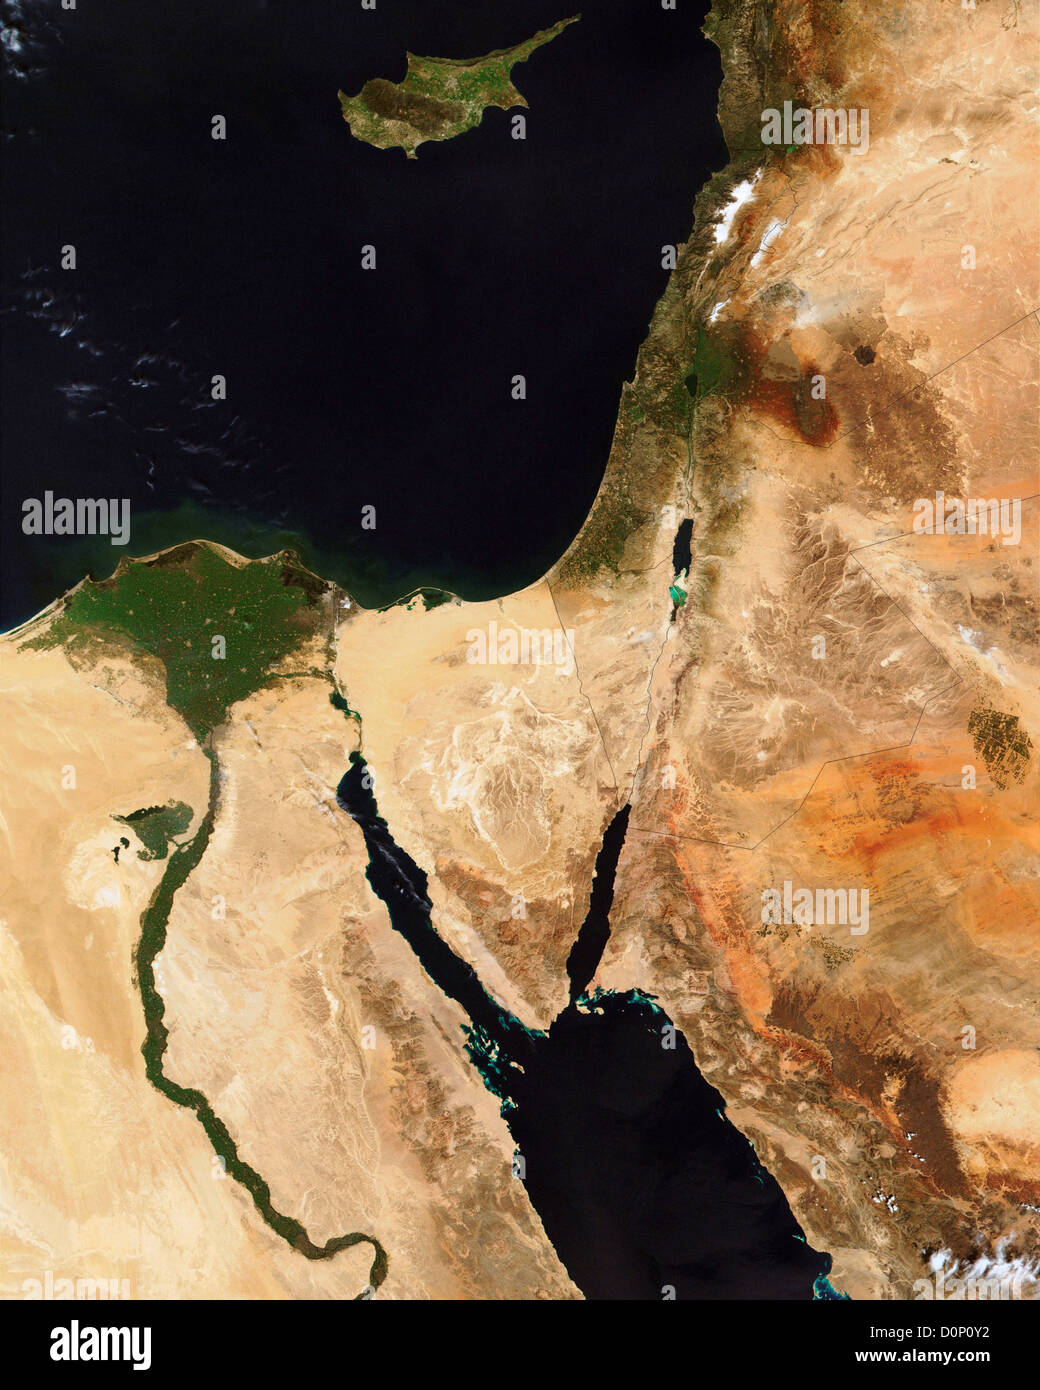 Middle East Map Dead Sea.Dead Sea Jordan Israel Nasa Stock Photos Dead Sea Jordan Israel